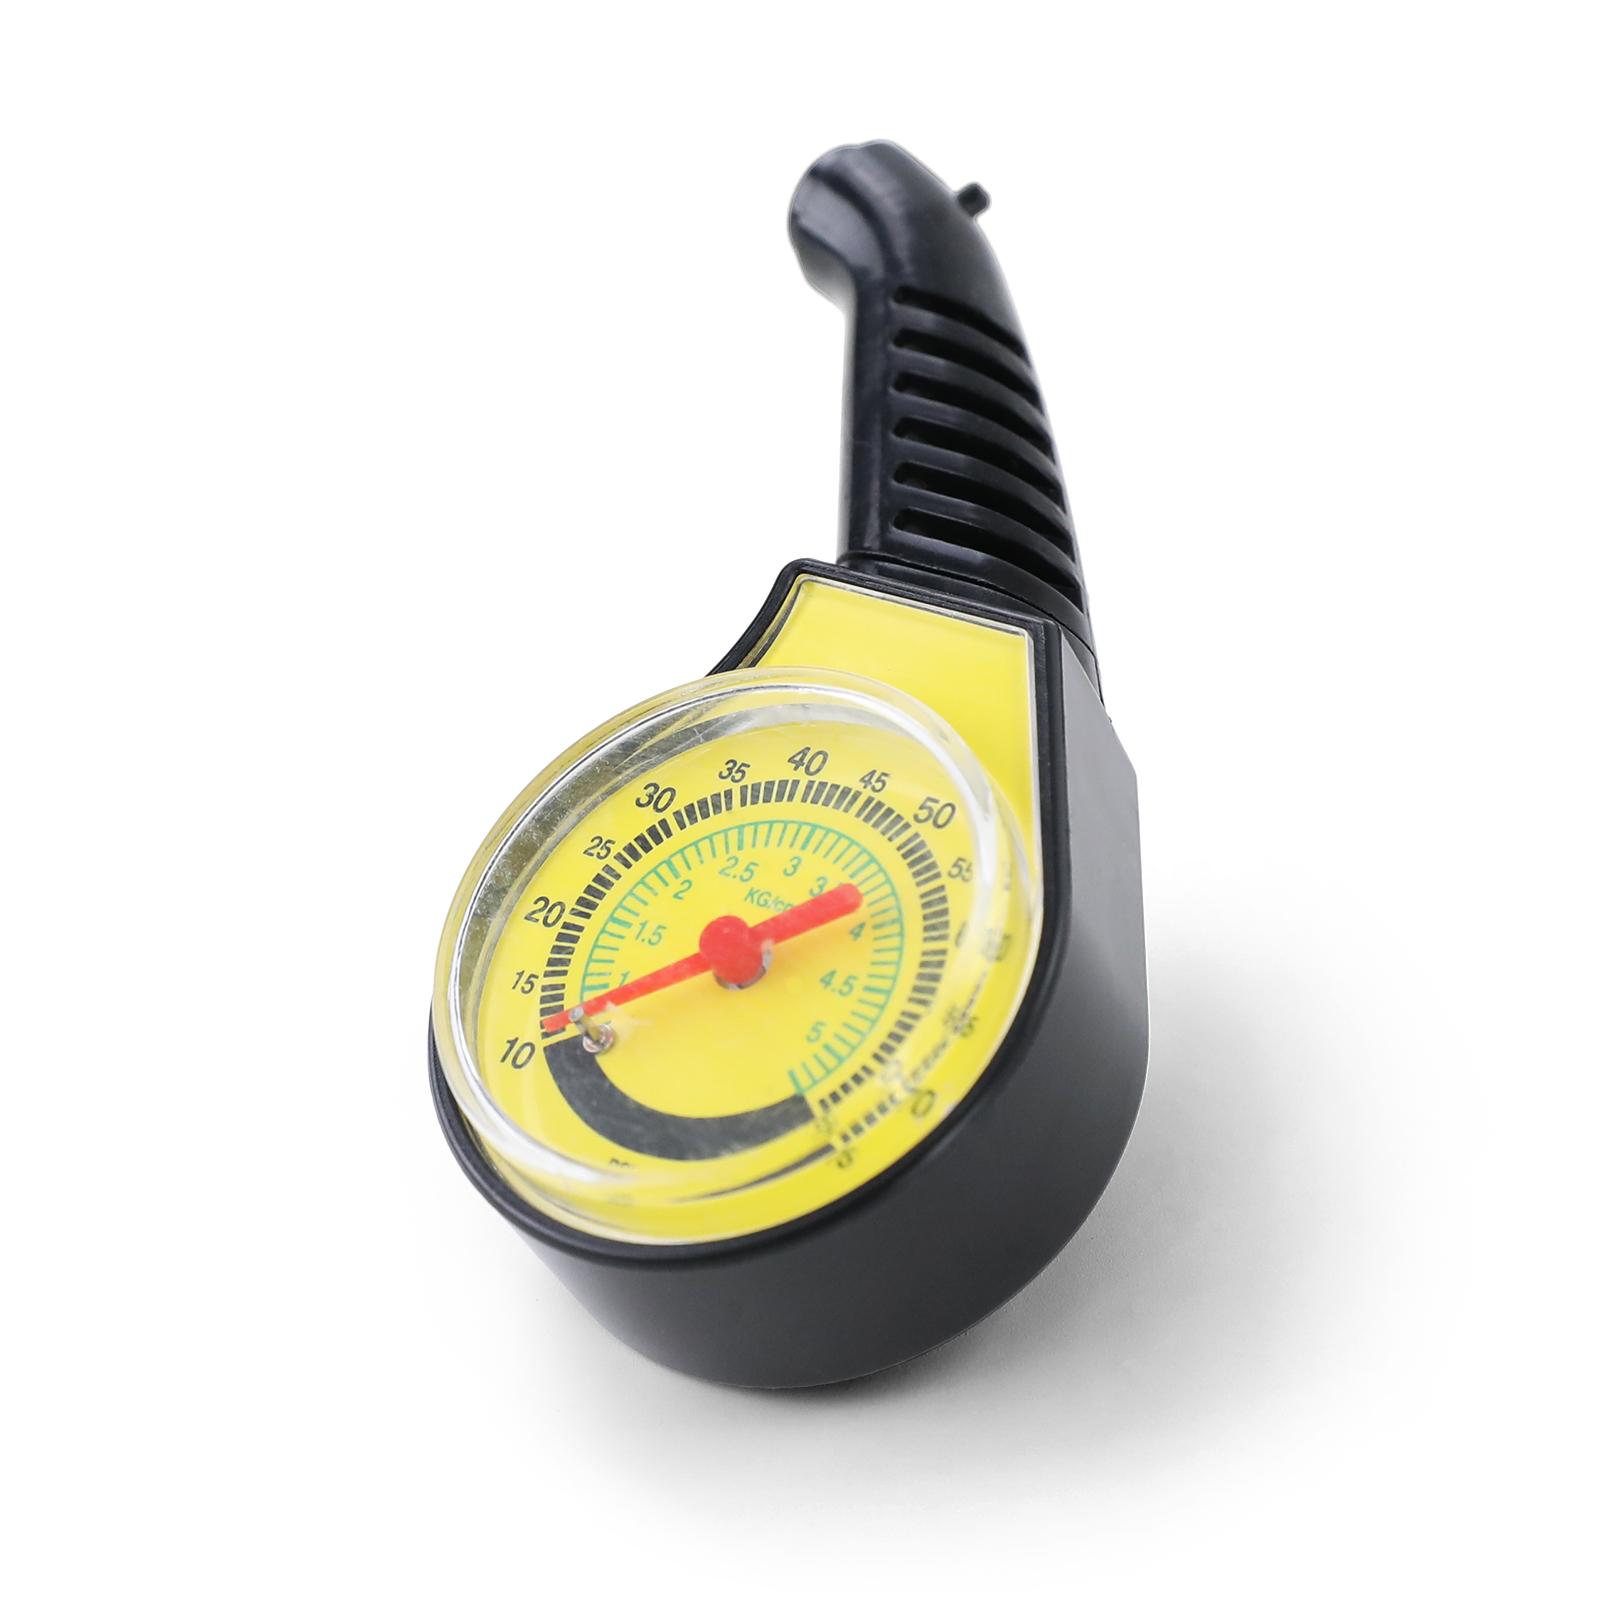 Auto KFZ Reifendruckmesser Luftdruckprüfer Manometer Analog